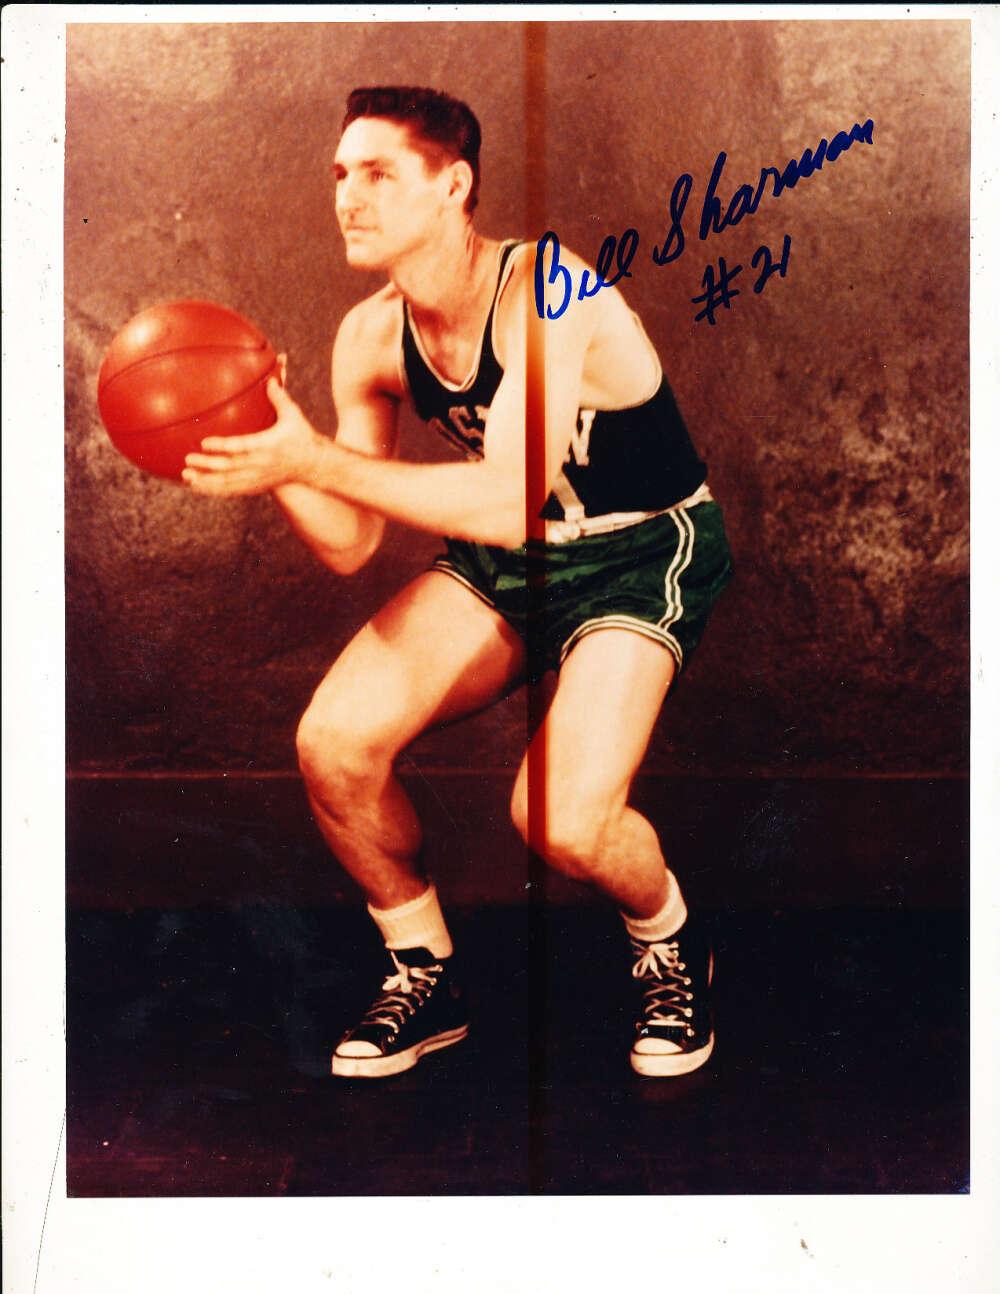 Bill Sharman Boston Celtics color signed 8x10 photo